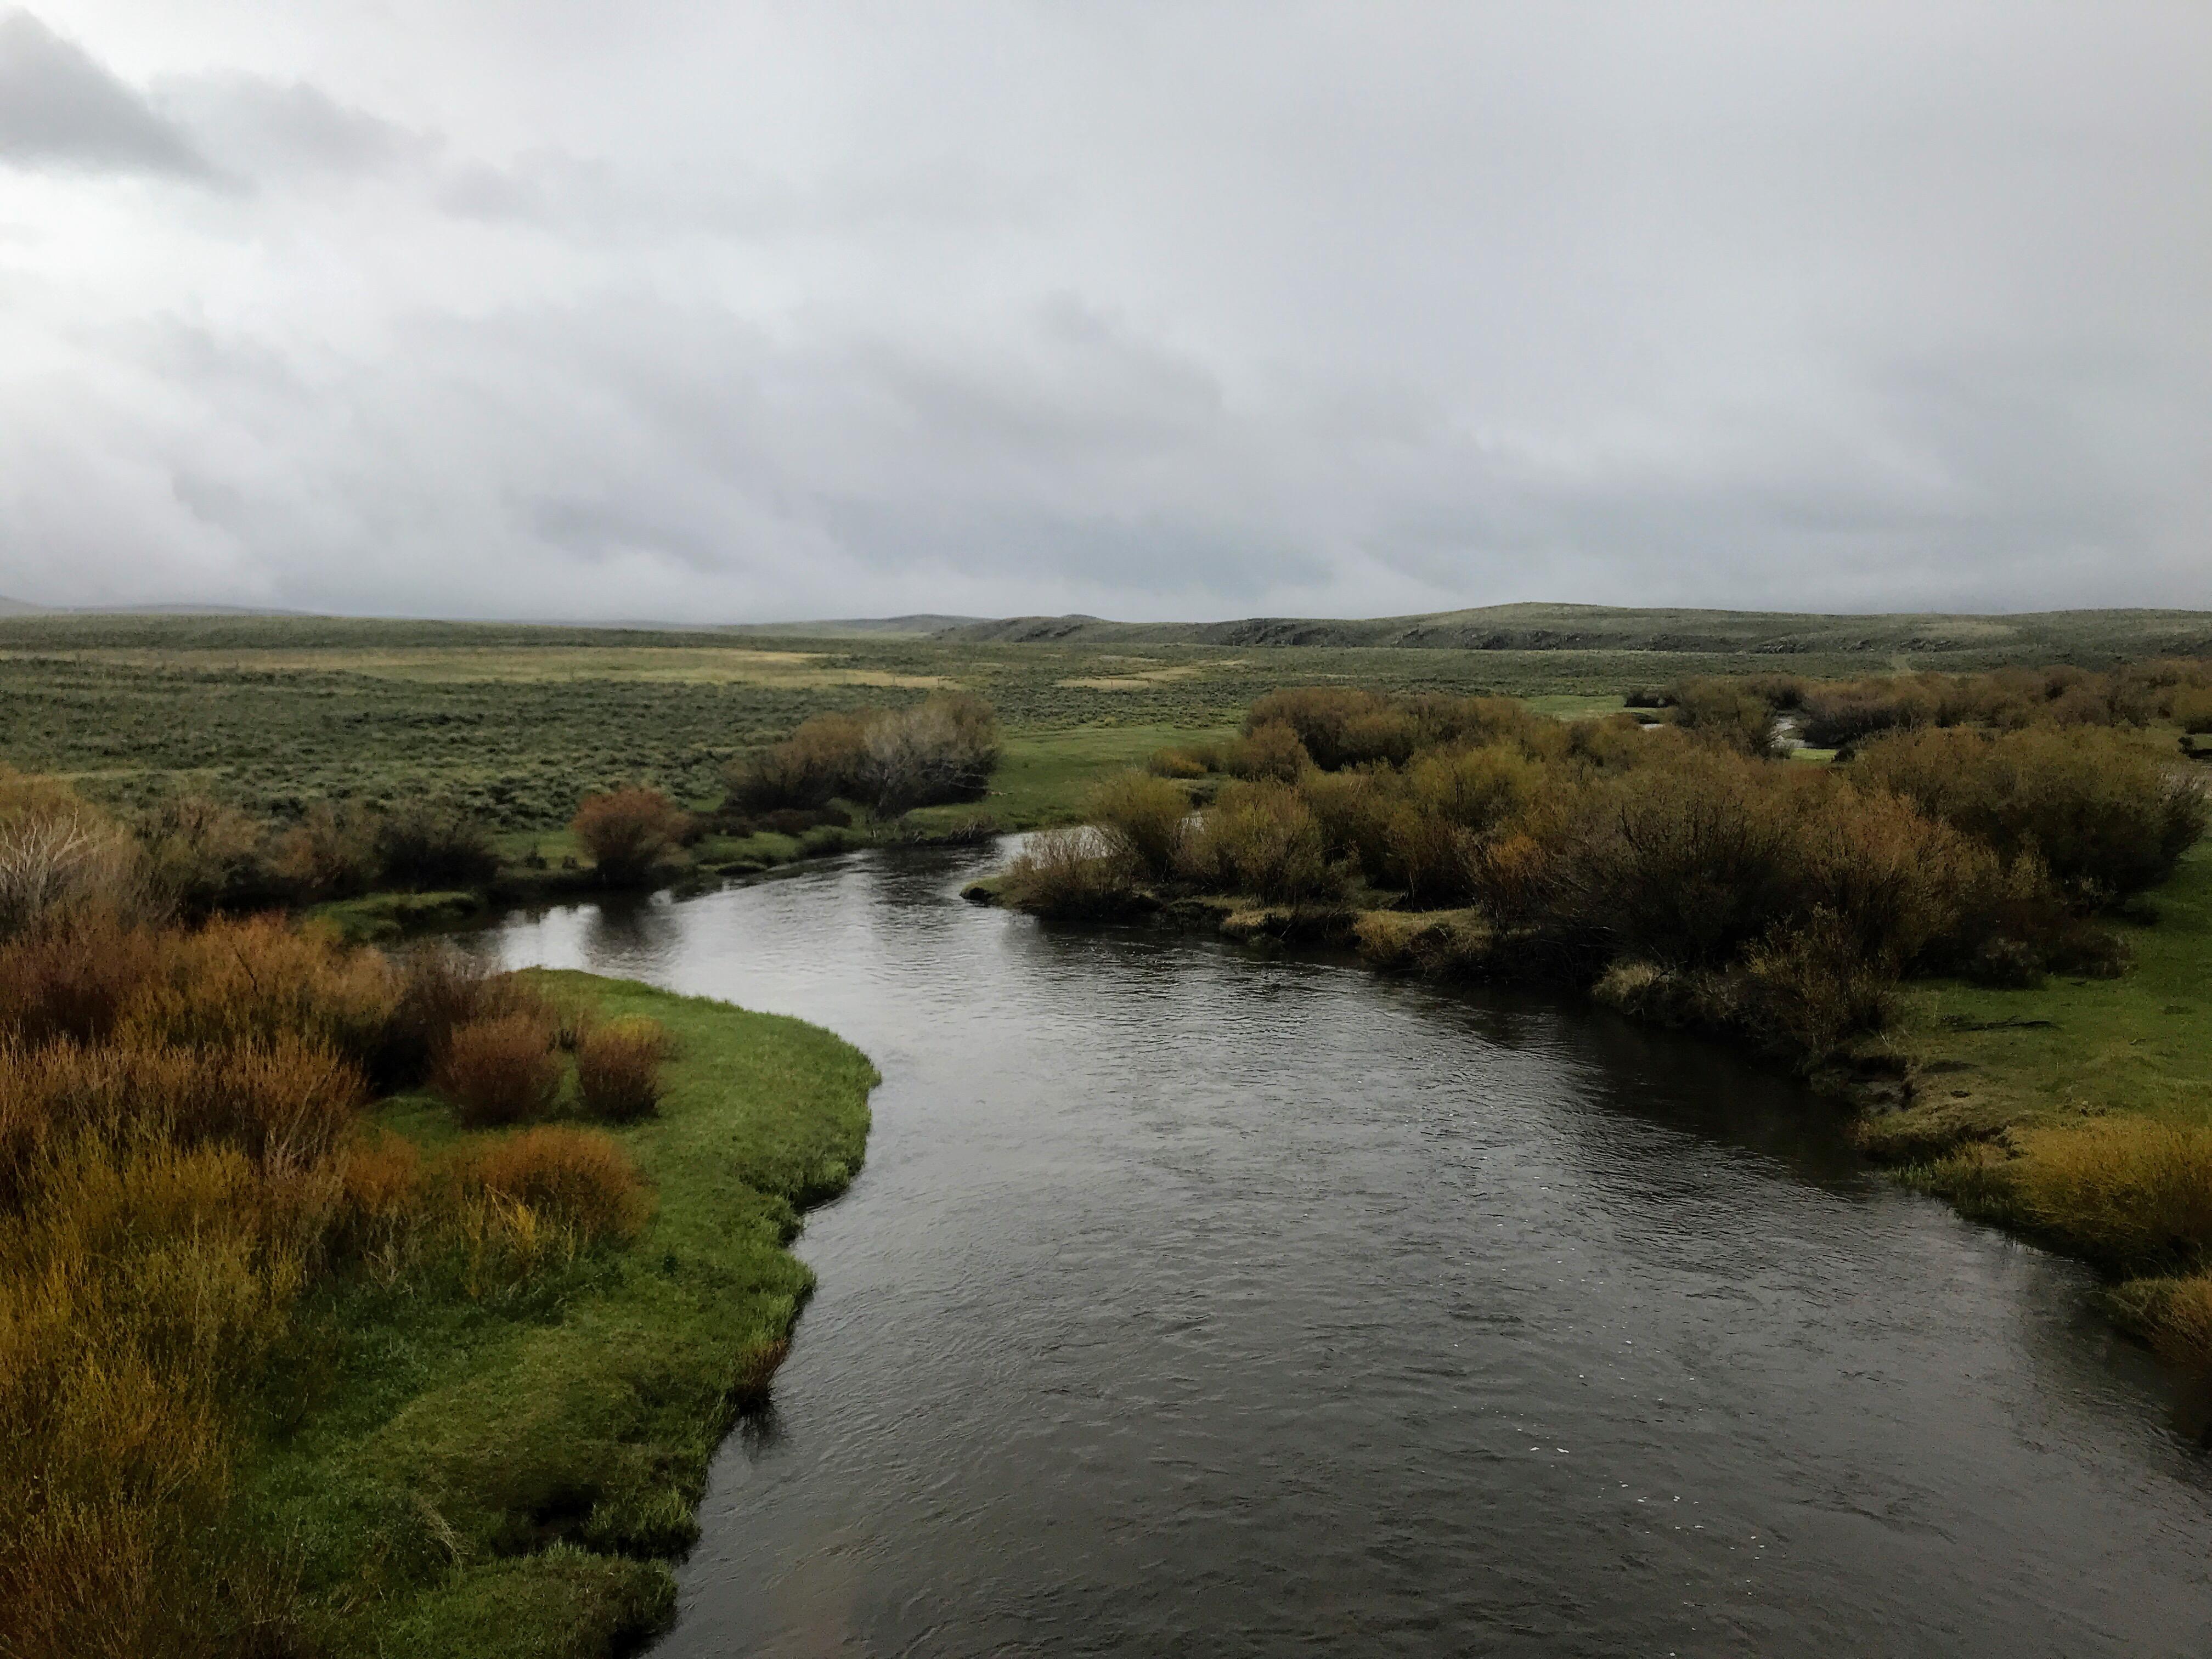 The Great Basin Part 1: It's Still Winter Everywhere! - The Trek